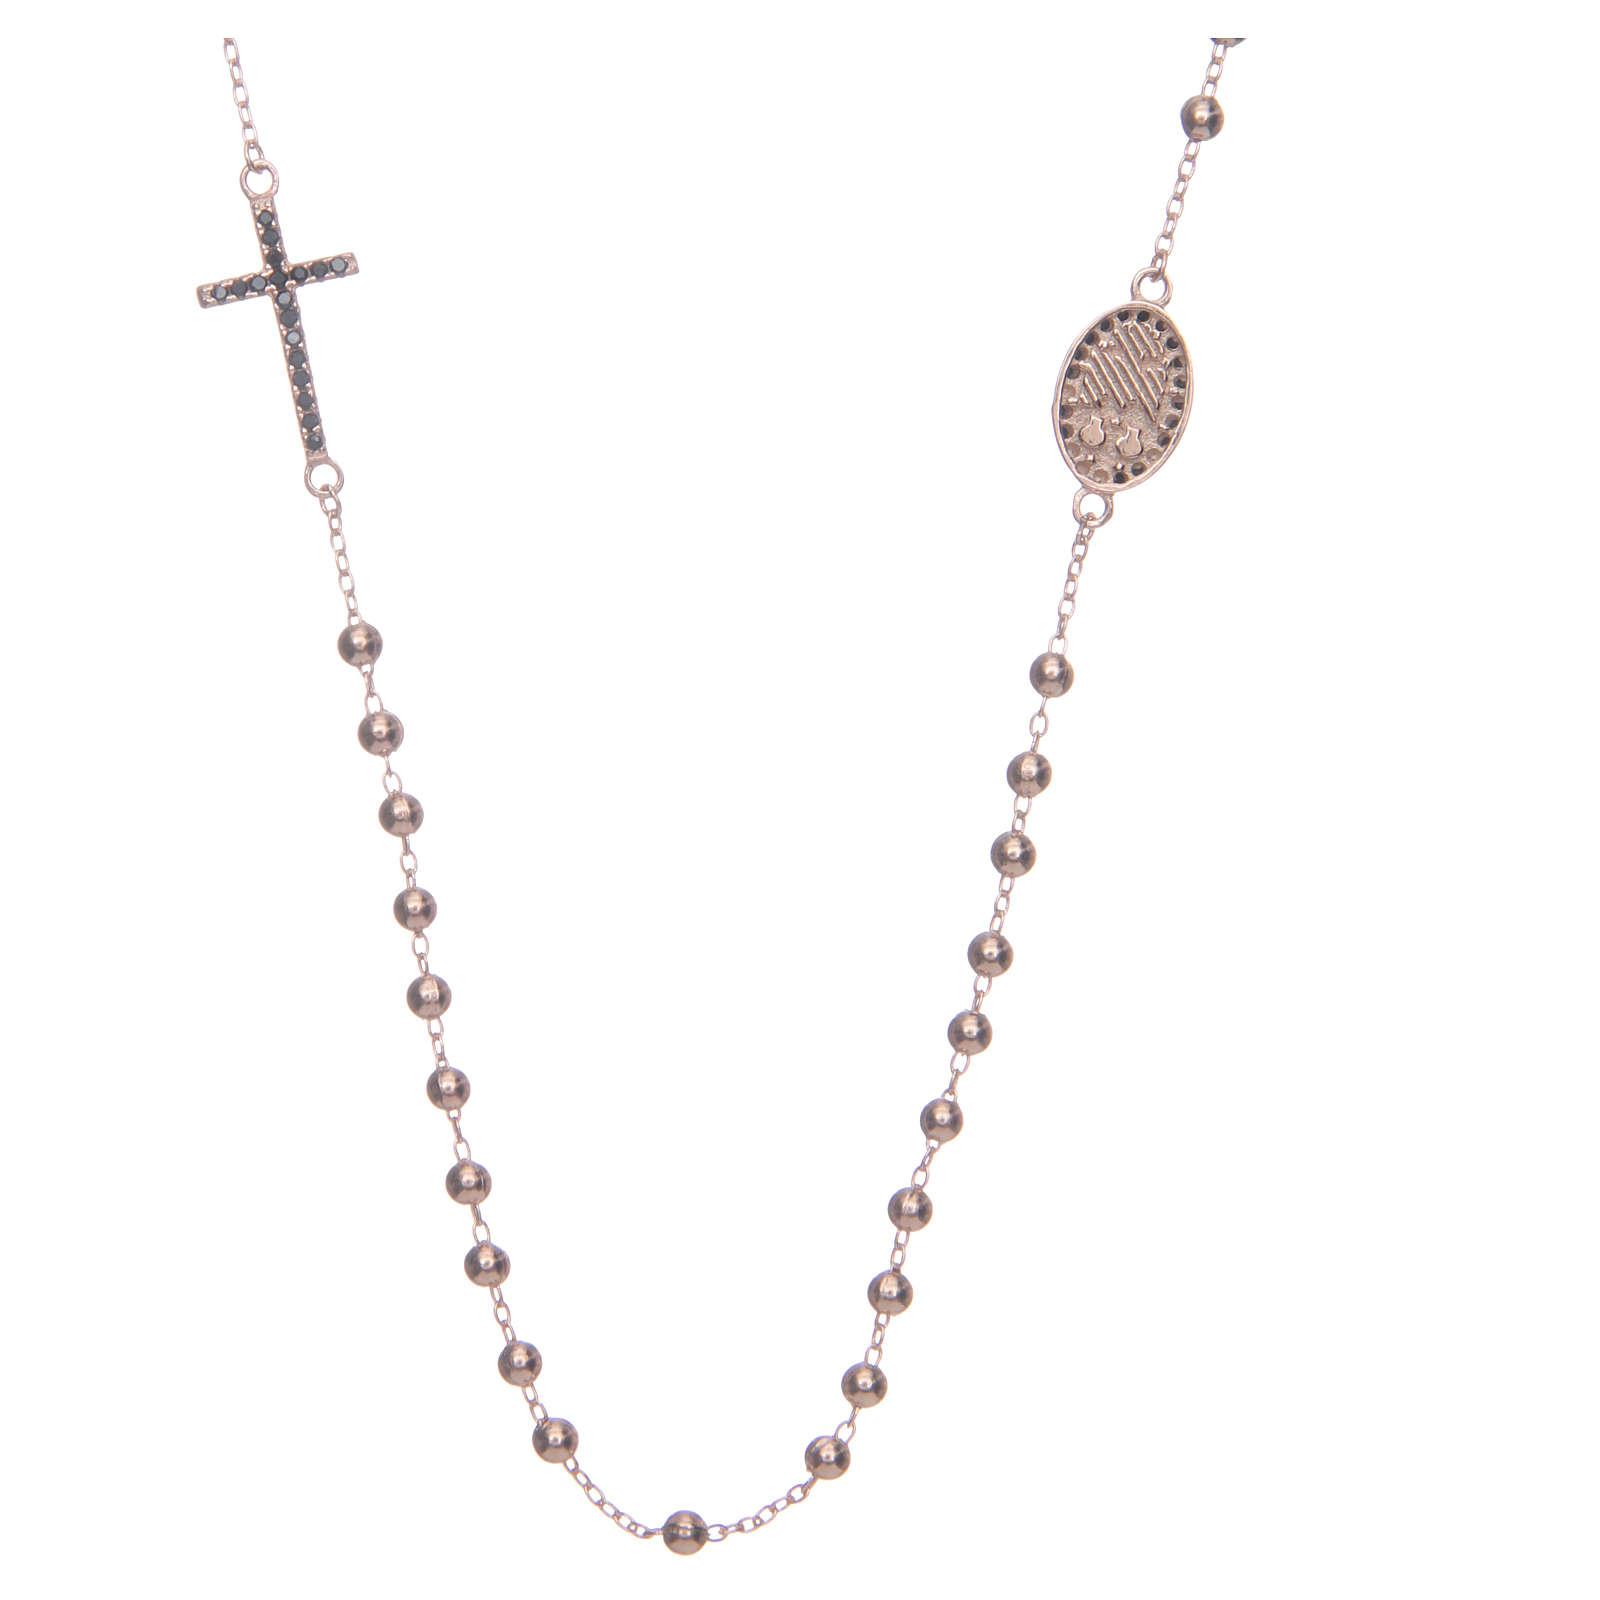 Rosary choker Saint Rita rosè with black zircons in 925 sterling silver 4